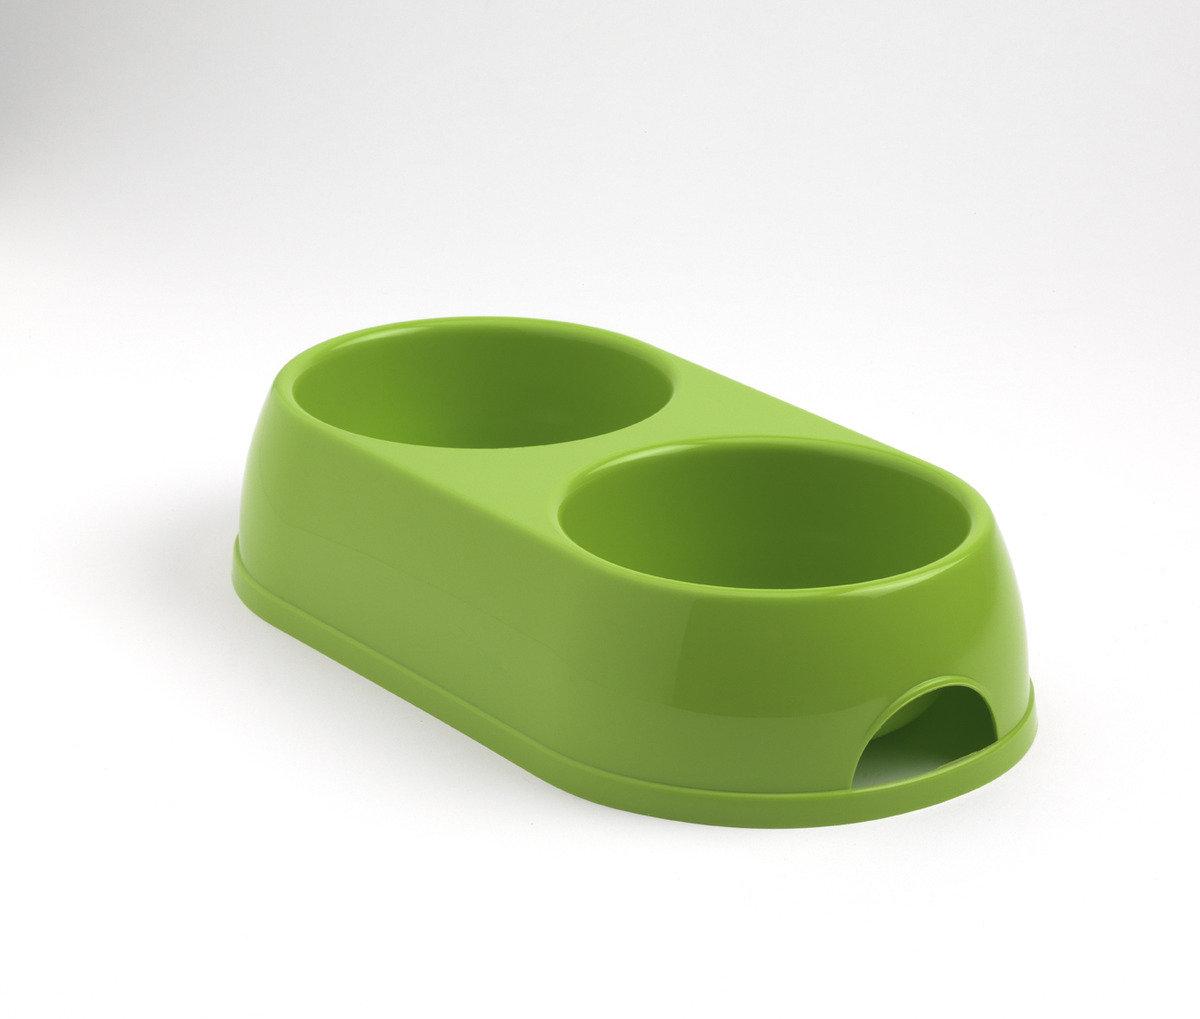 Double Bowl  寵物碗 H122 - 蘋果綠色